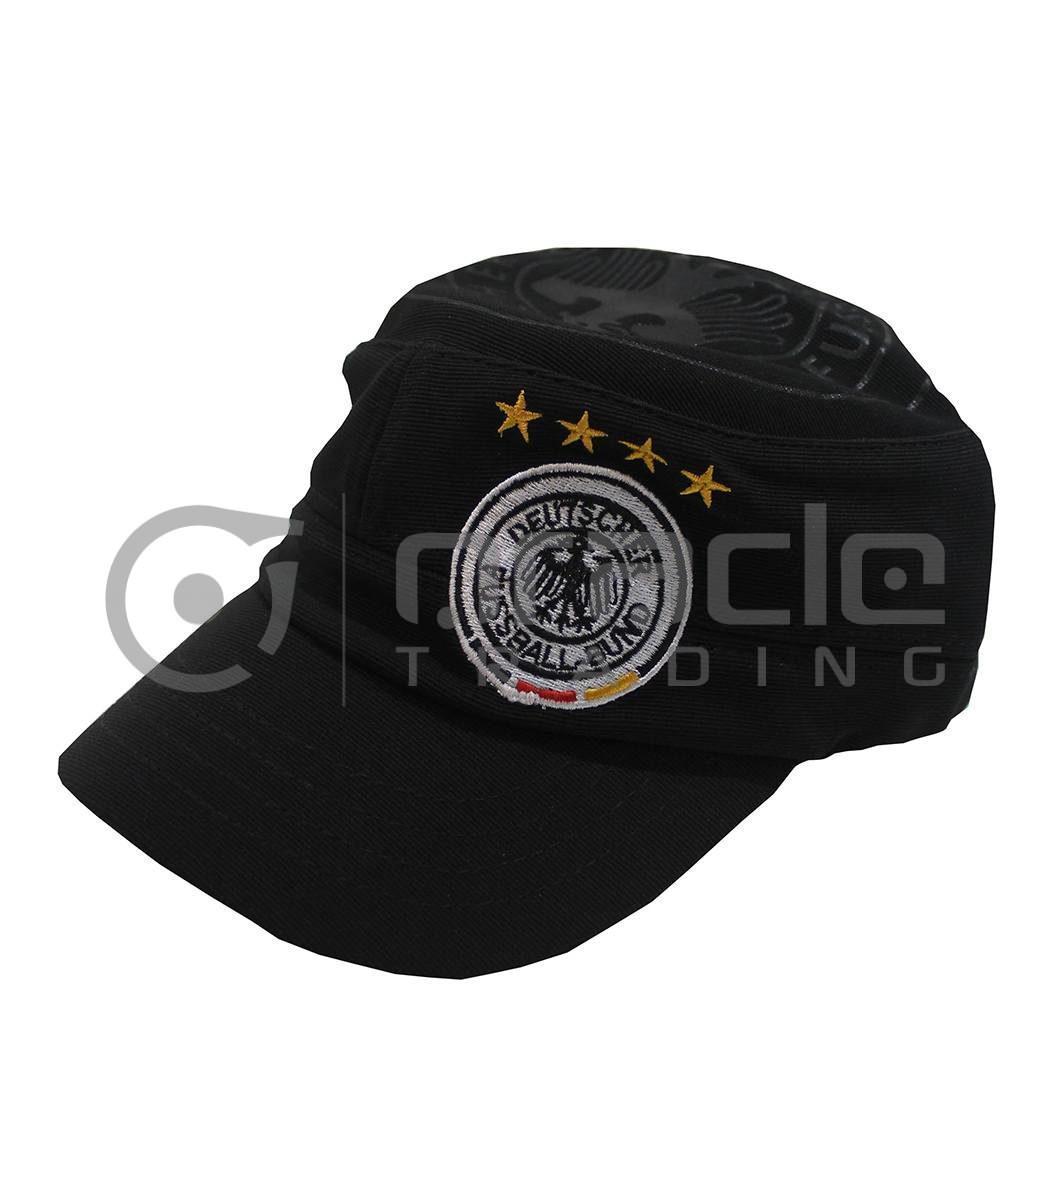 Germany Flex-Fit Army Hat